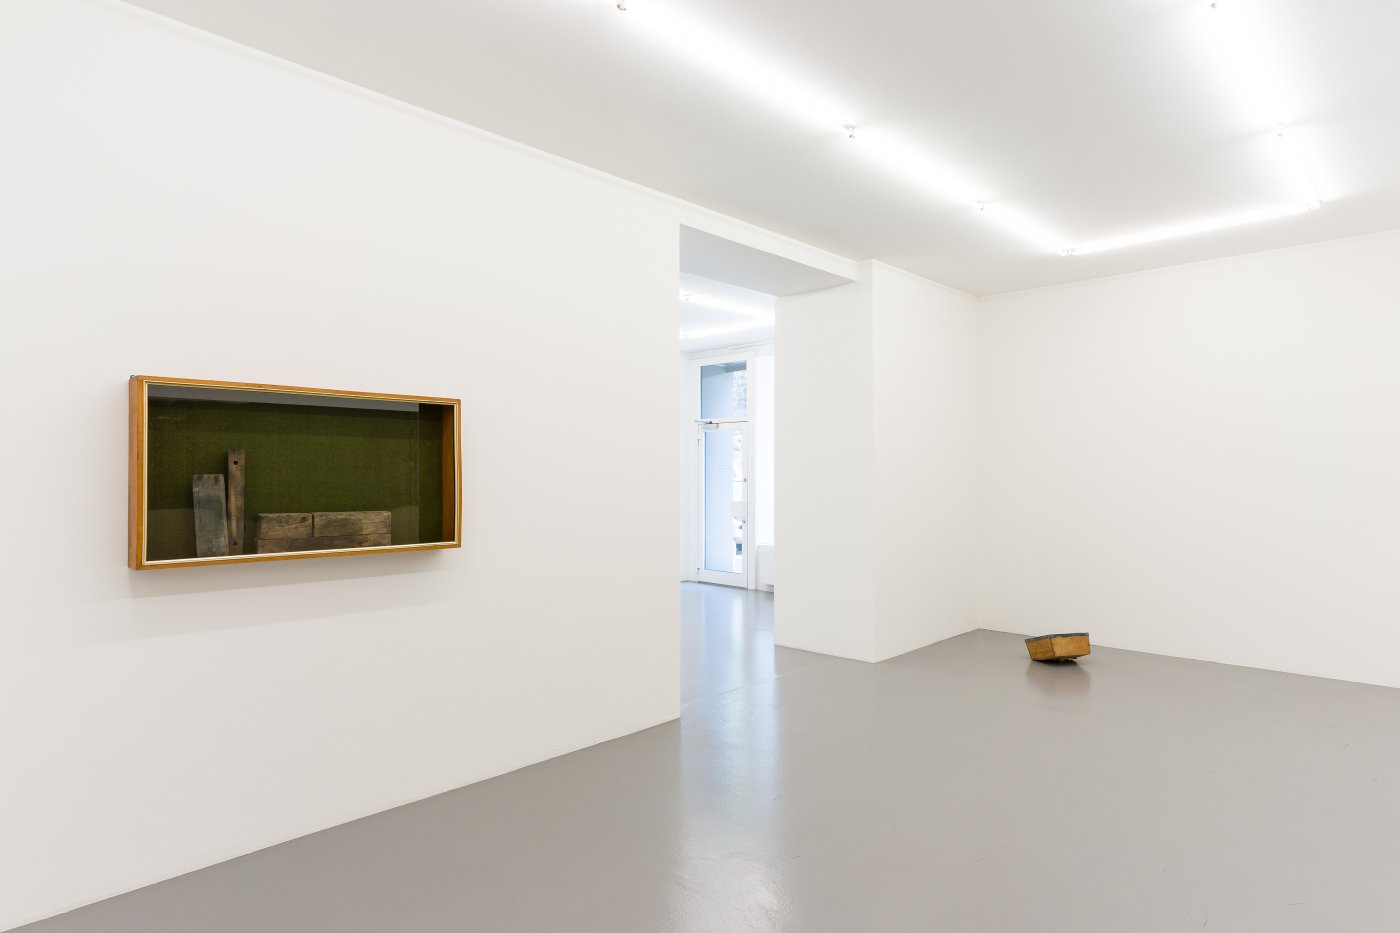 Mai 36 Galerie Cabrita 2